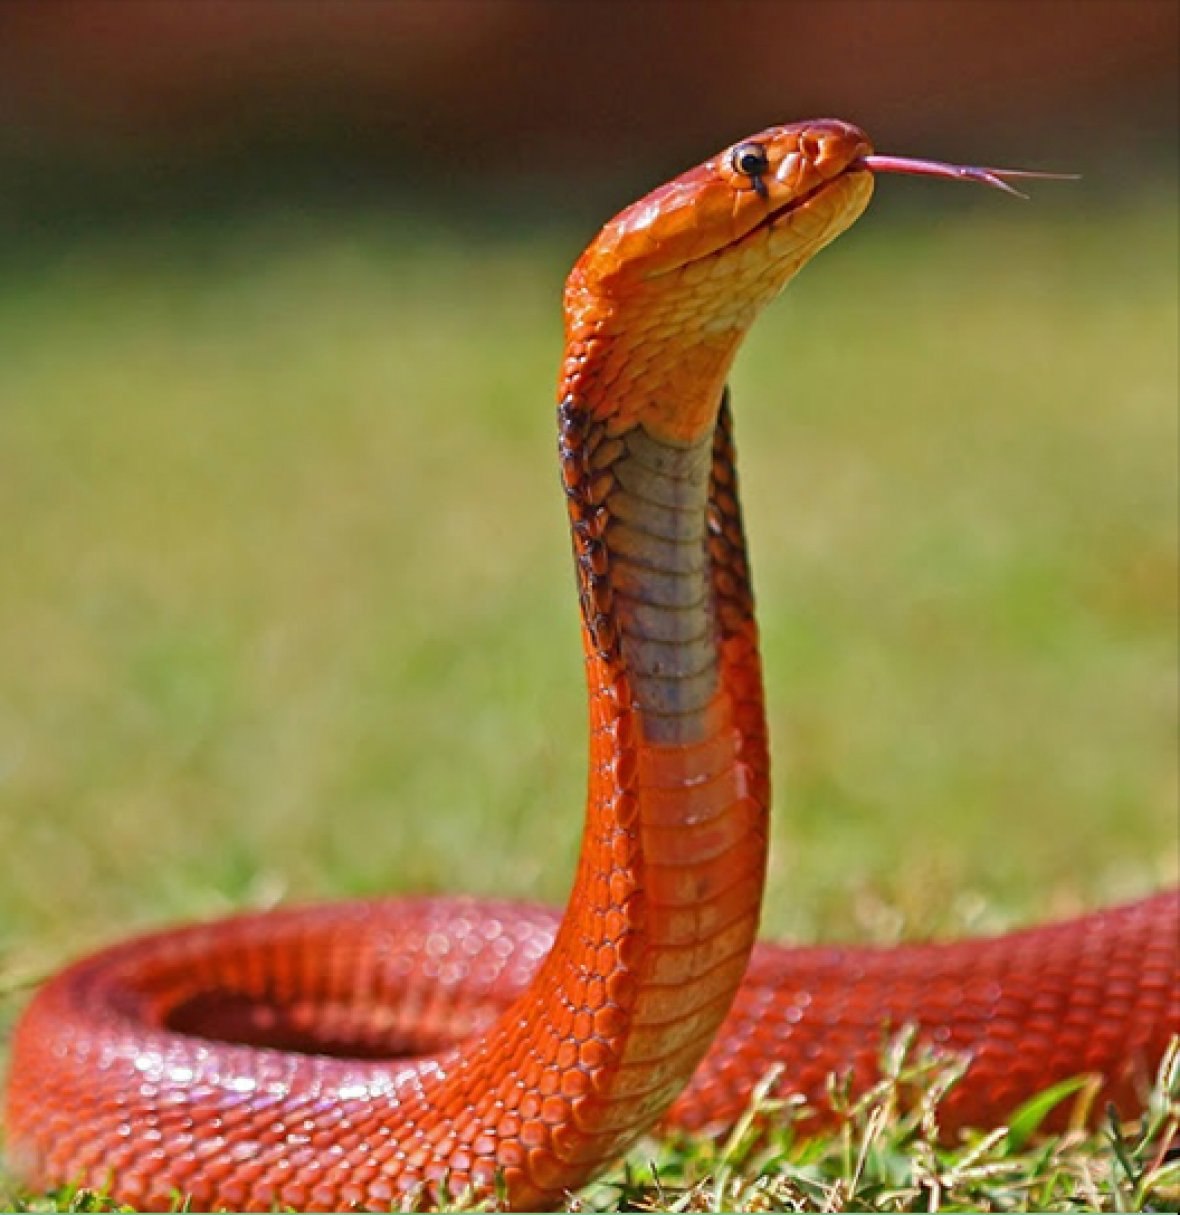 Sudan cobra